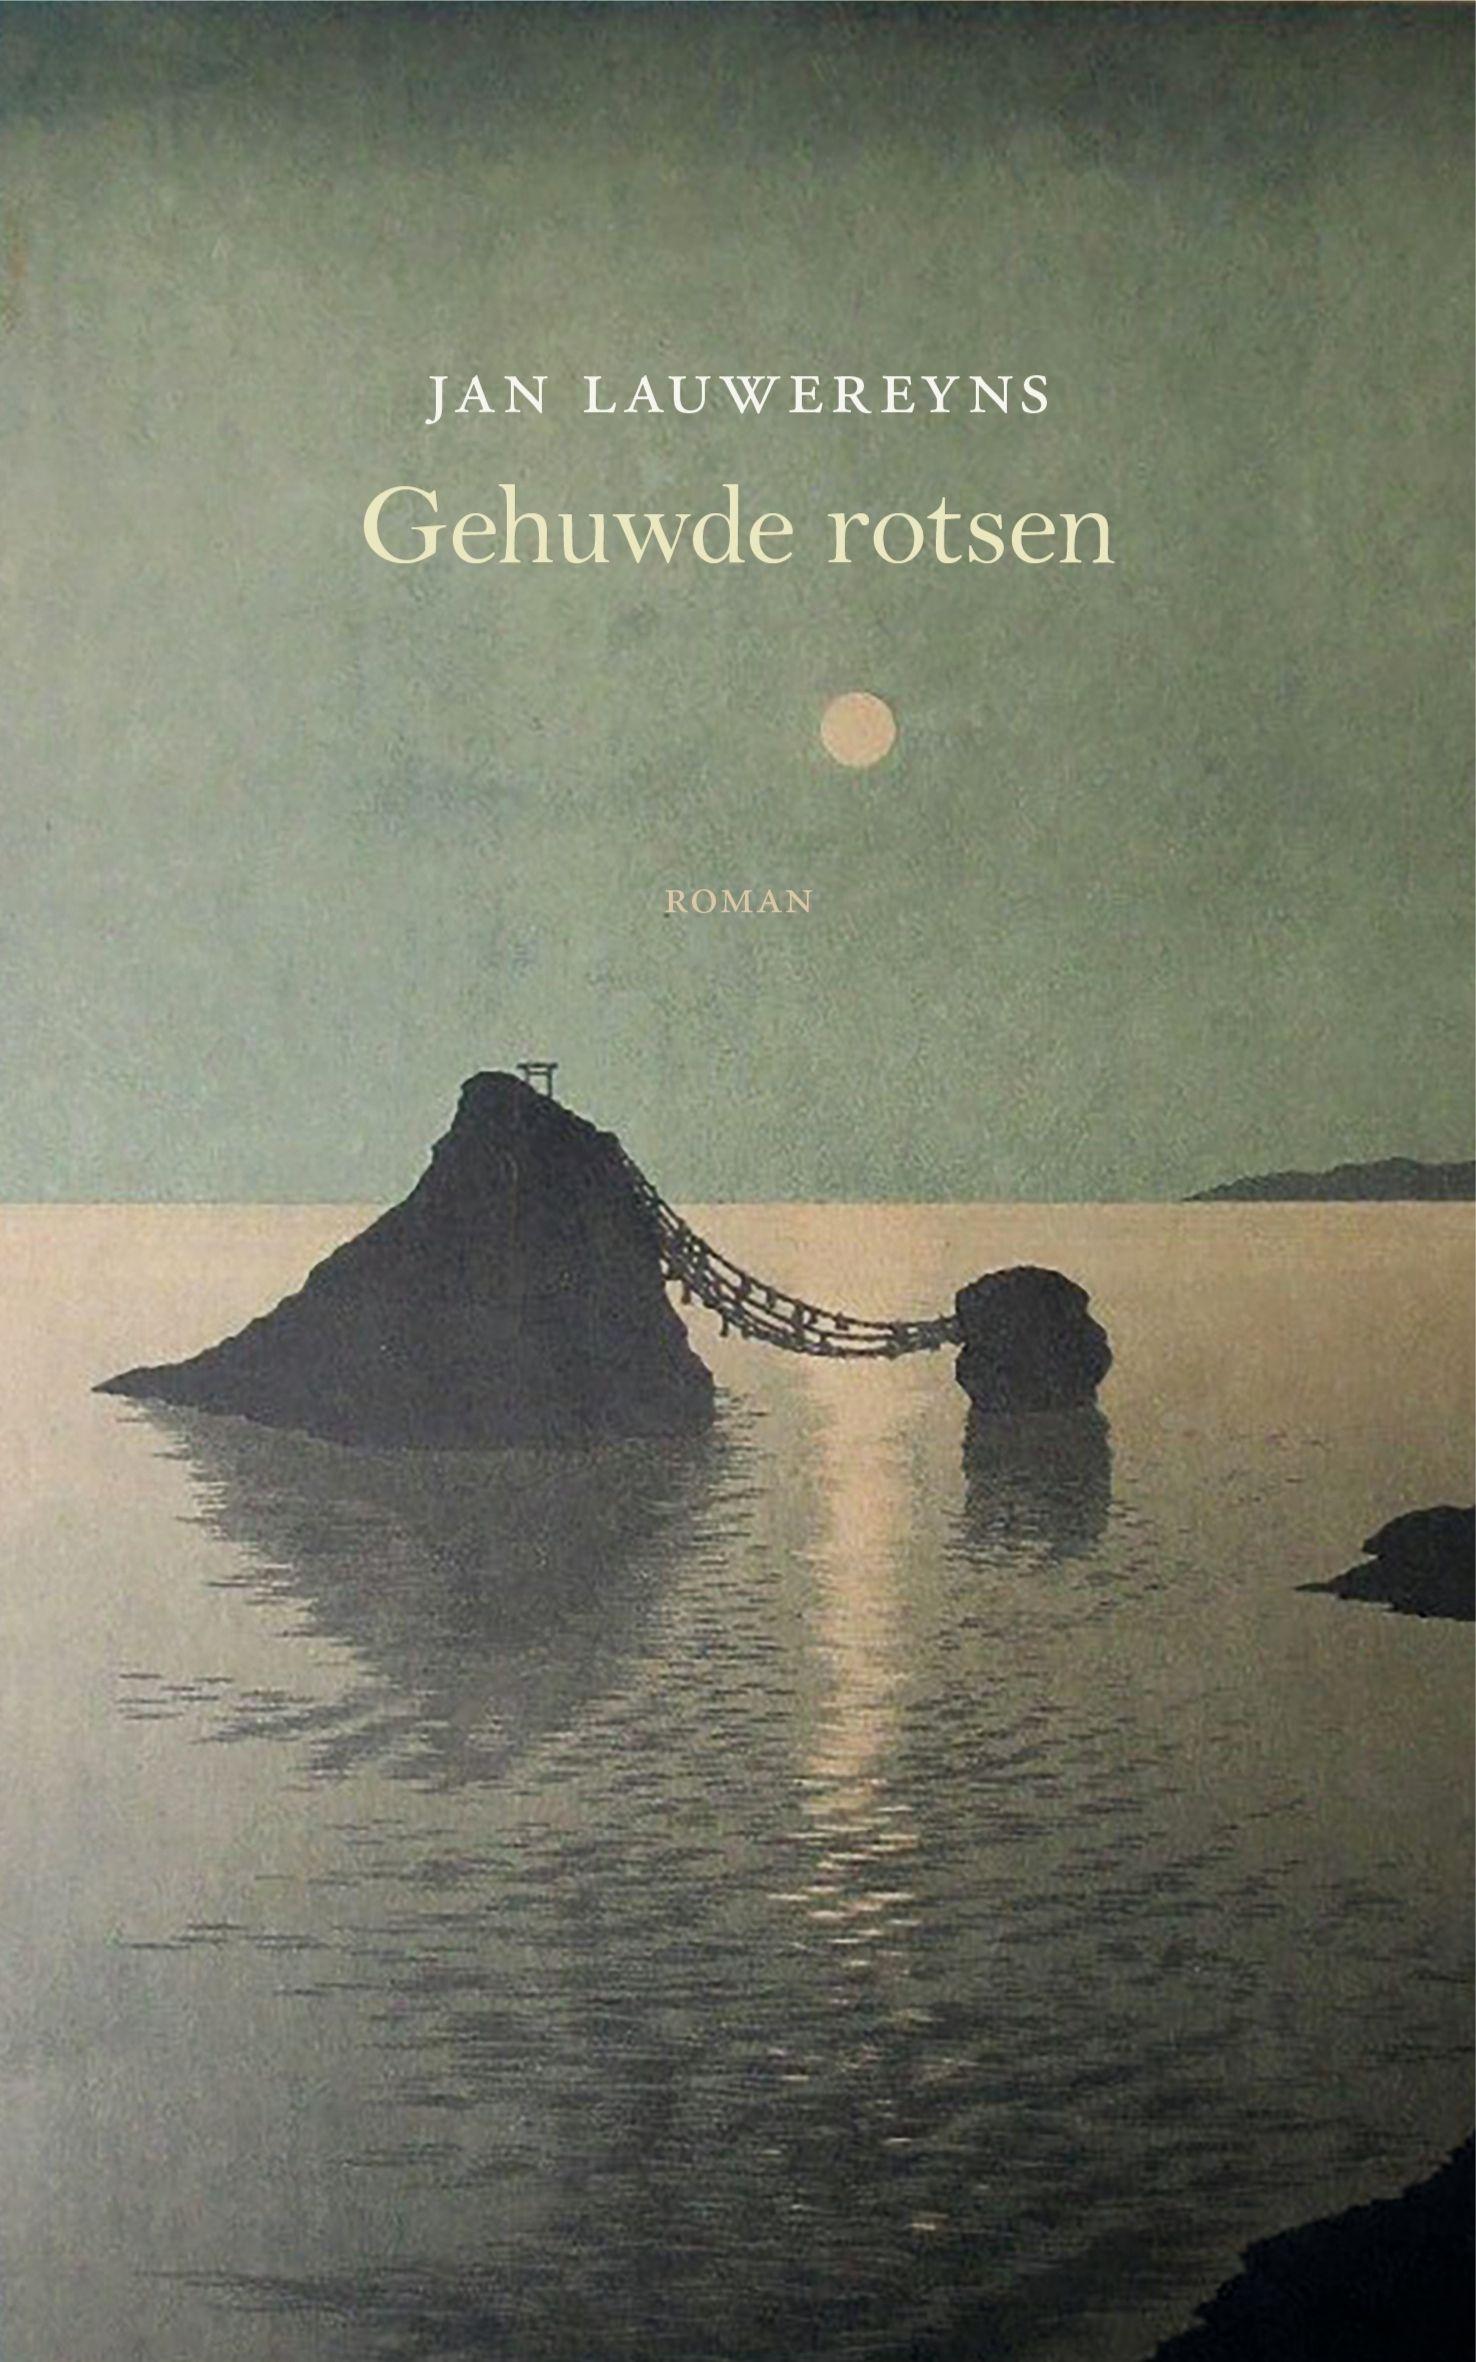 Gehuwde rotsen – Jan Lauwereyns